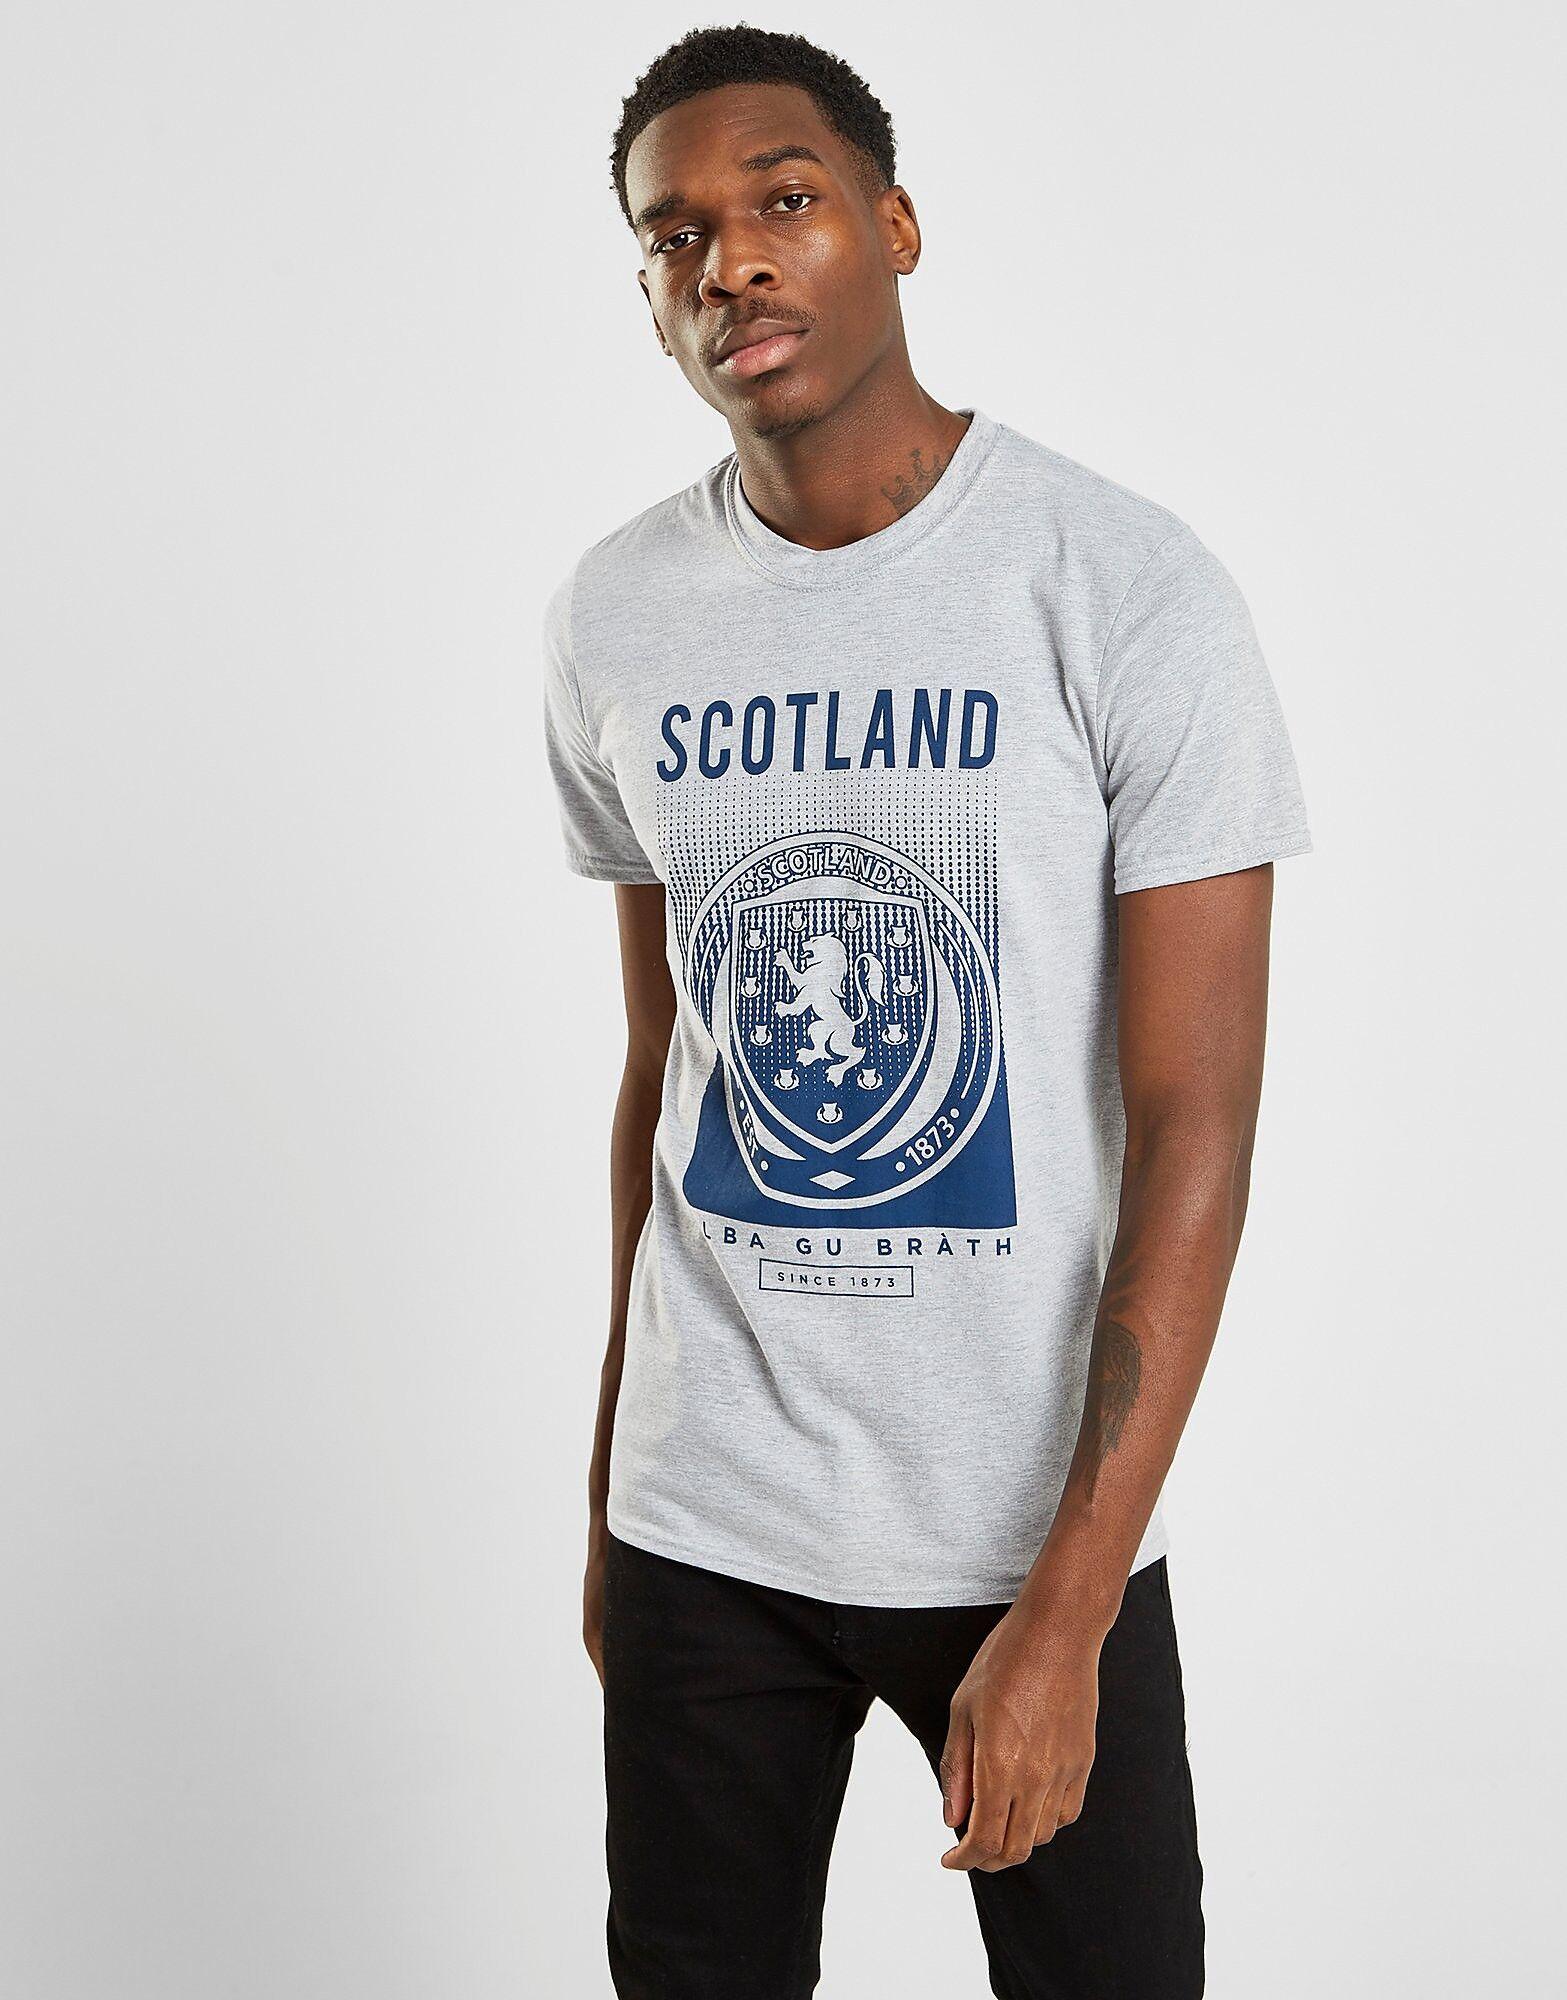 Official Team Scotland FA t-paita Miehet - Mens, Harmaa